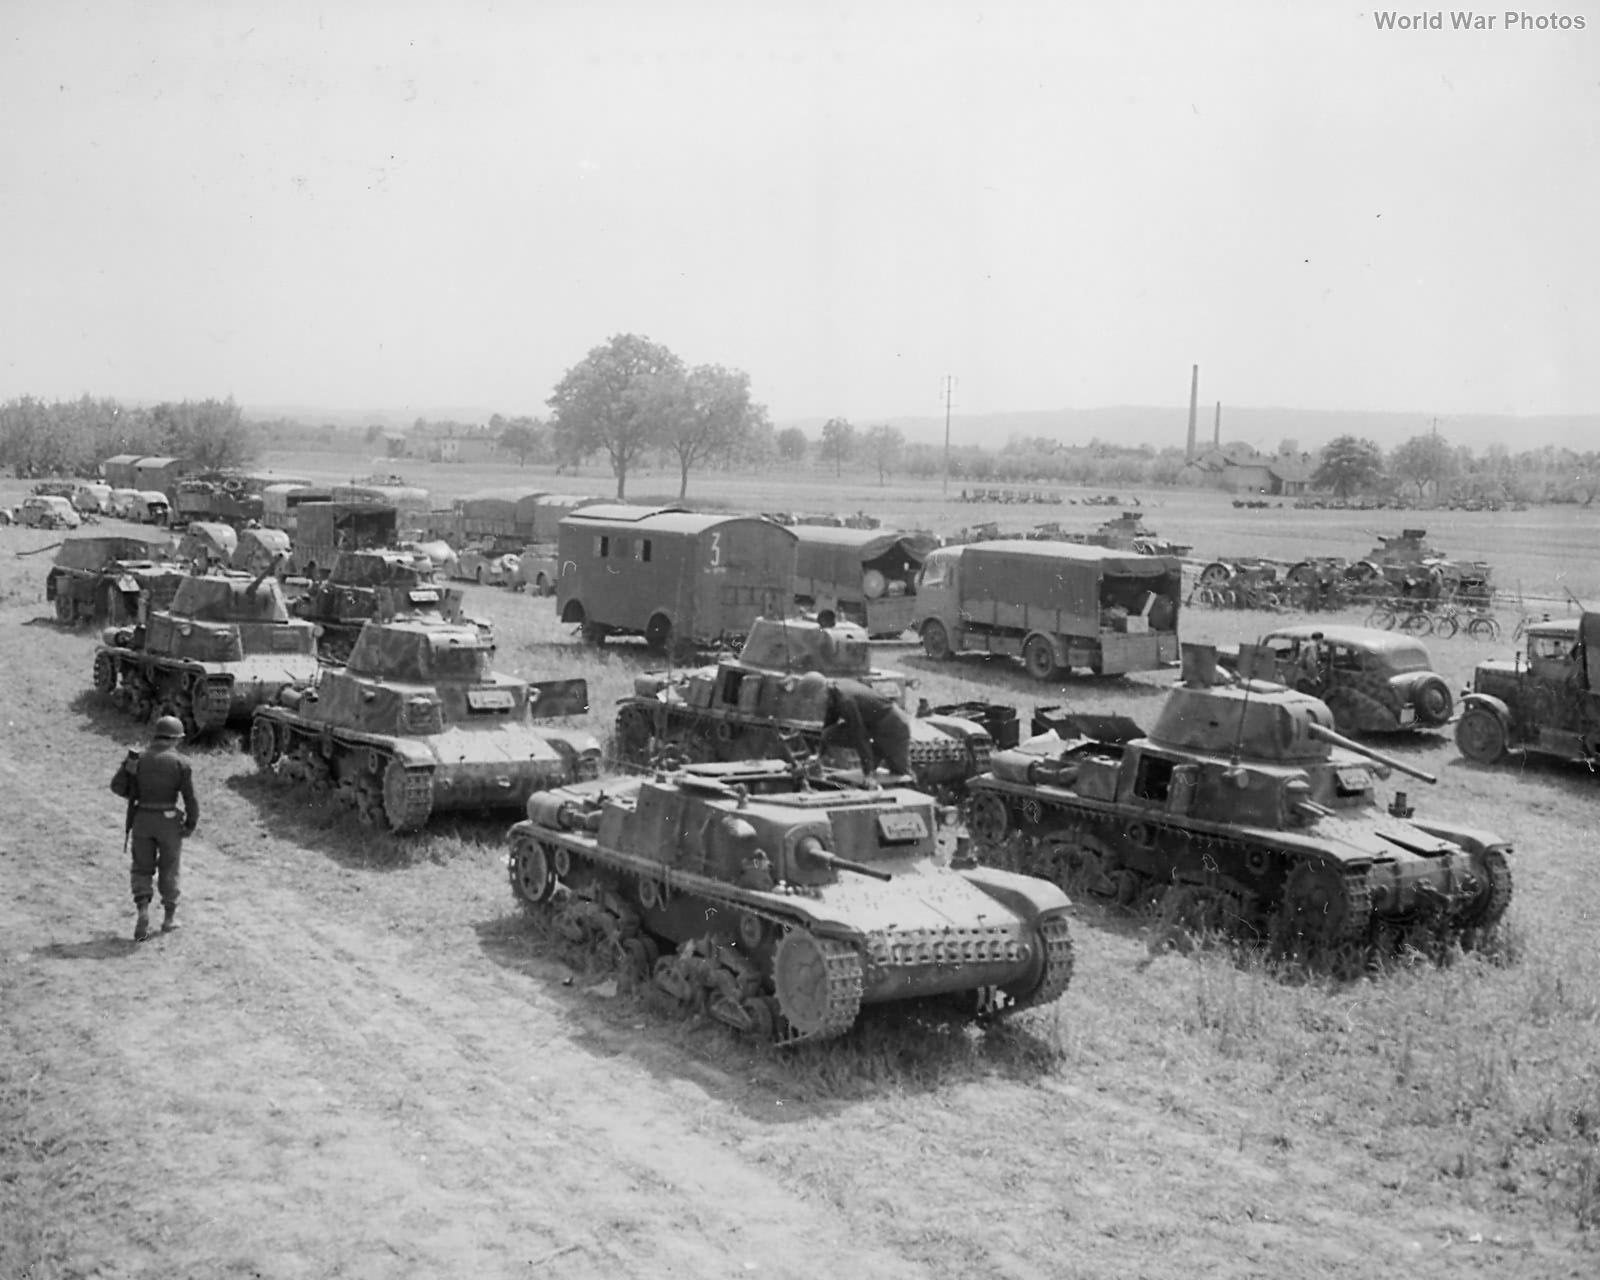 34th ID captures Italian tanks, staff cars and trucks Ivrea